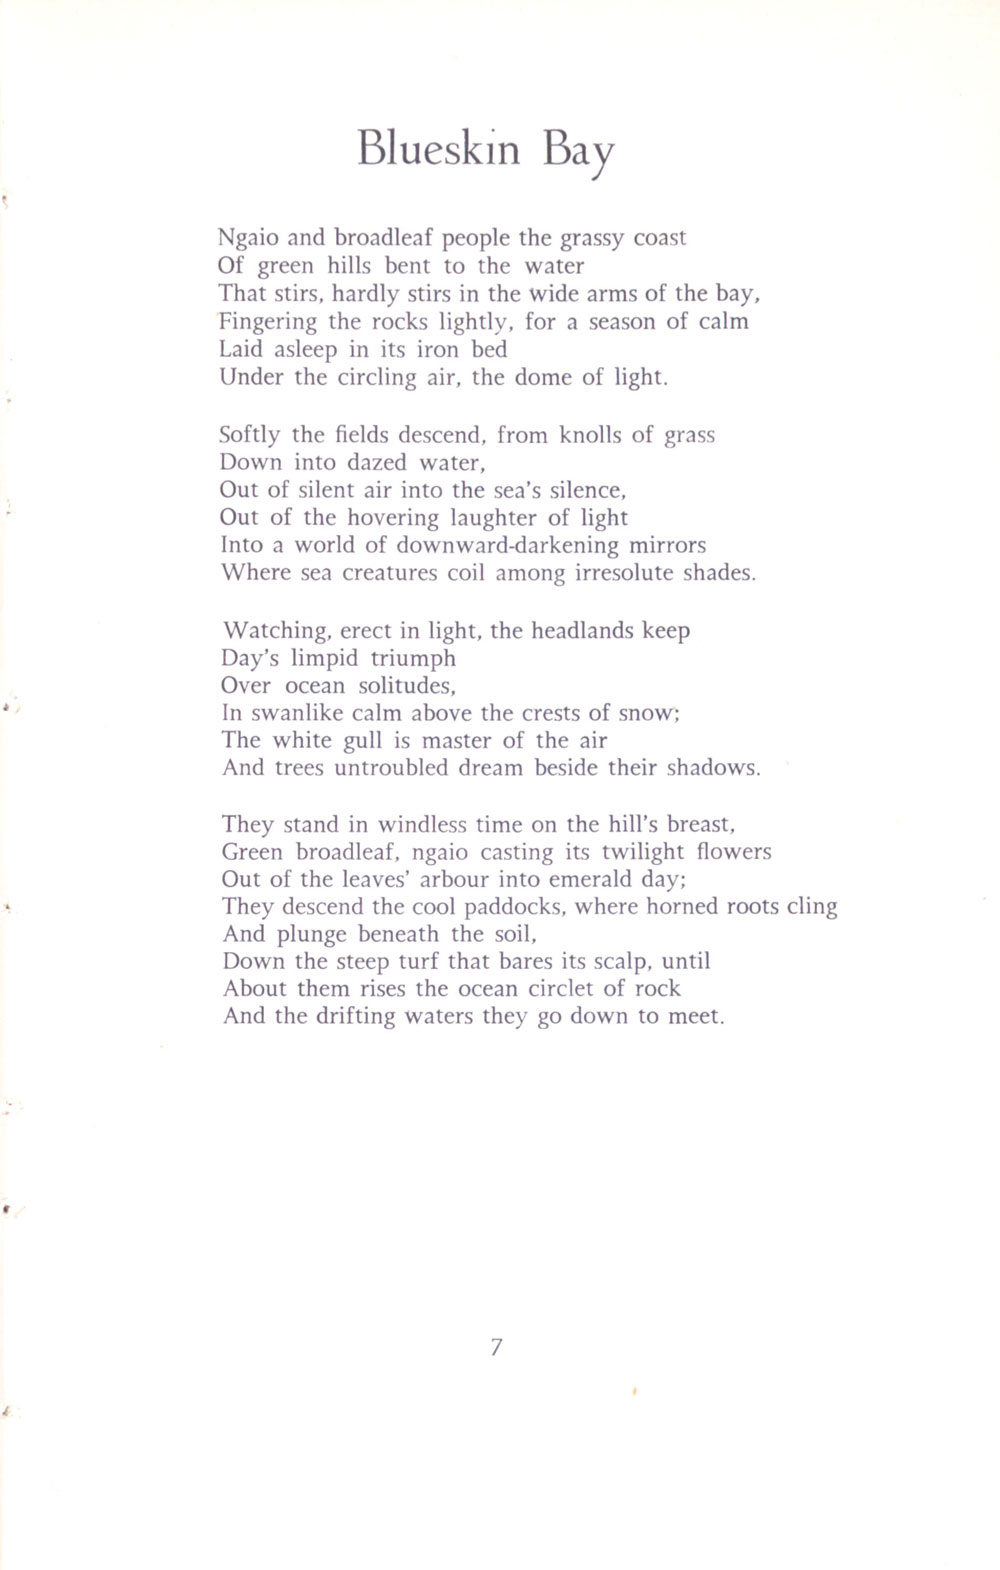 Charles Brasch. <em>The estate and other poems</em>. Christchurch: Caxton Press, 1957.